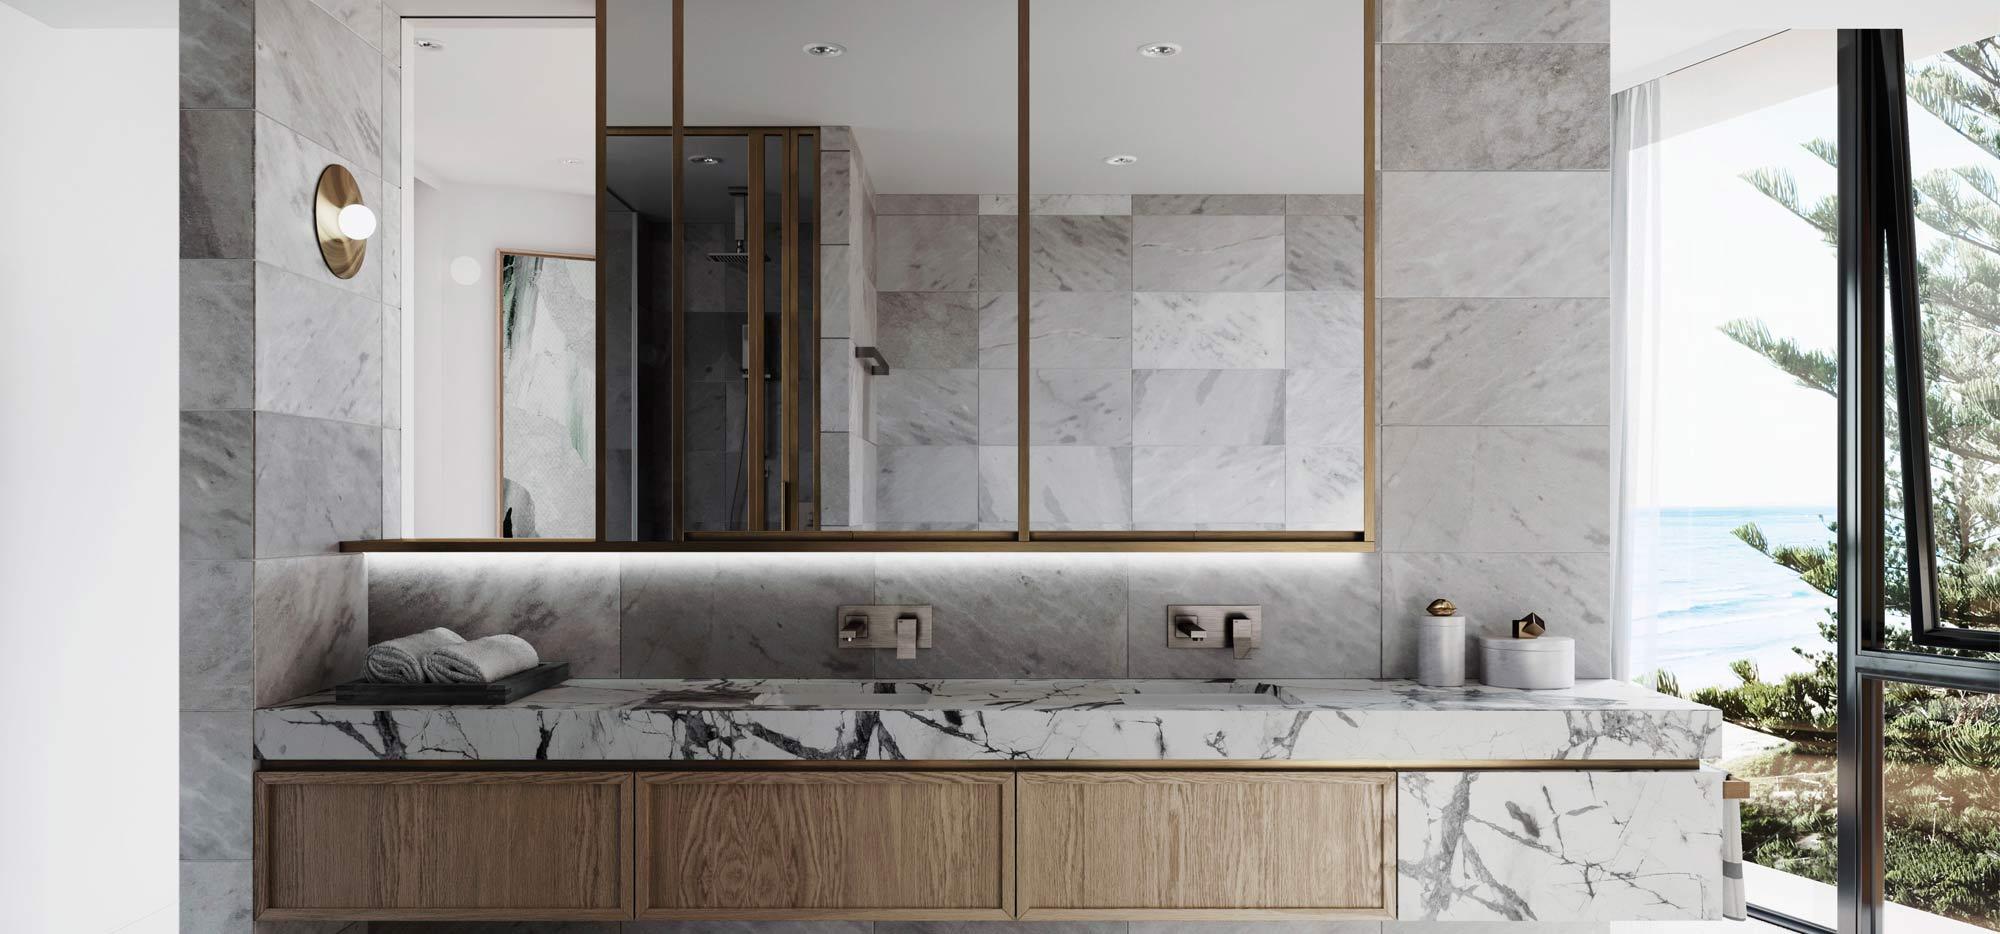 Solace-Broadbeach-Bathroom2-New.jpg